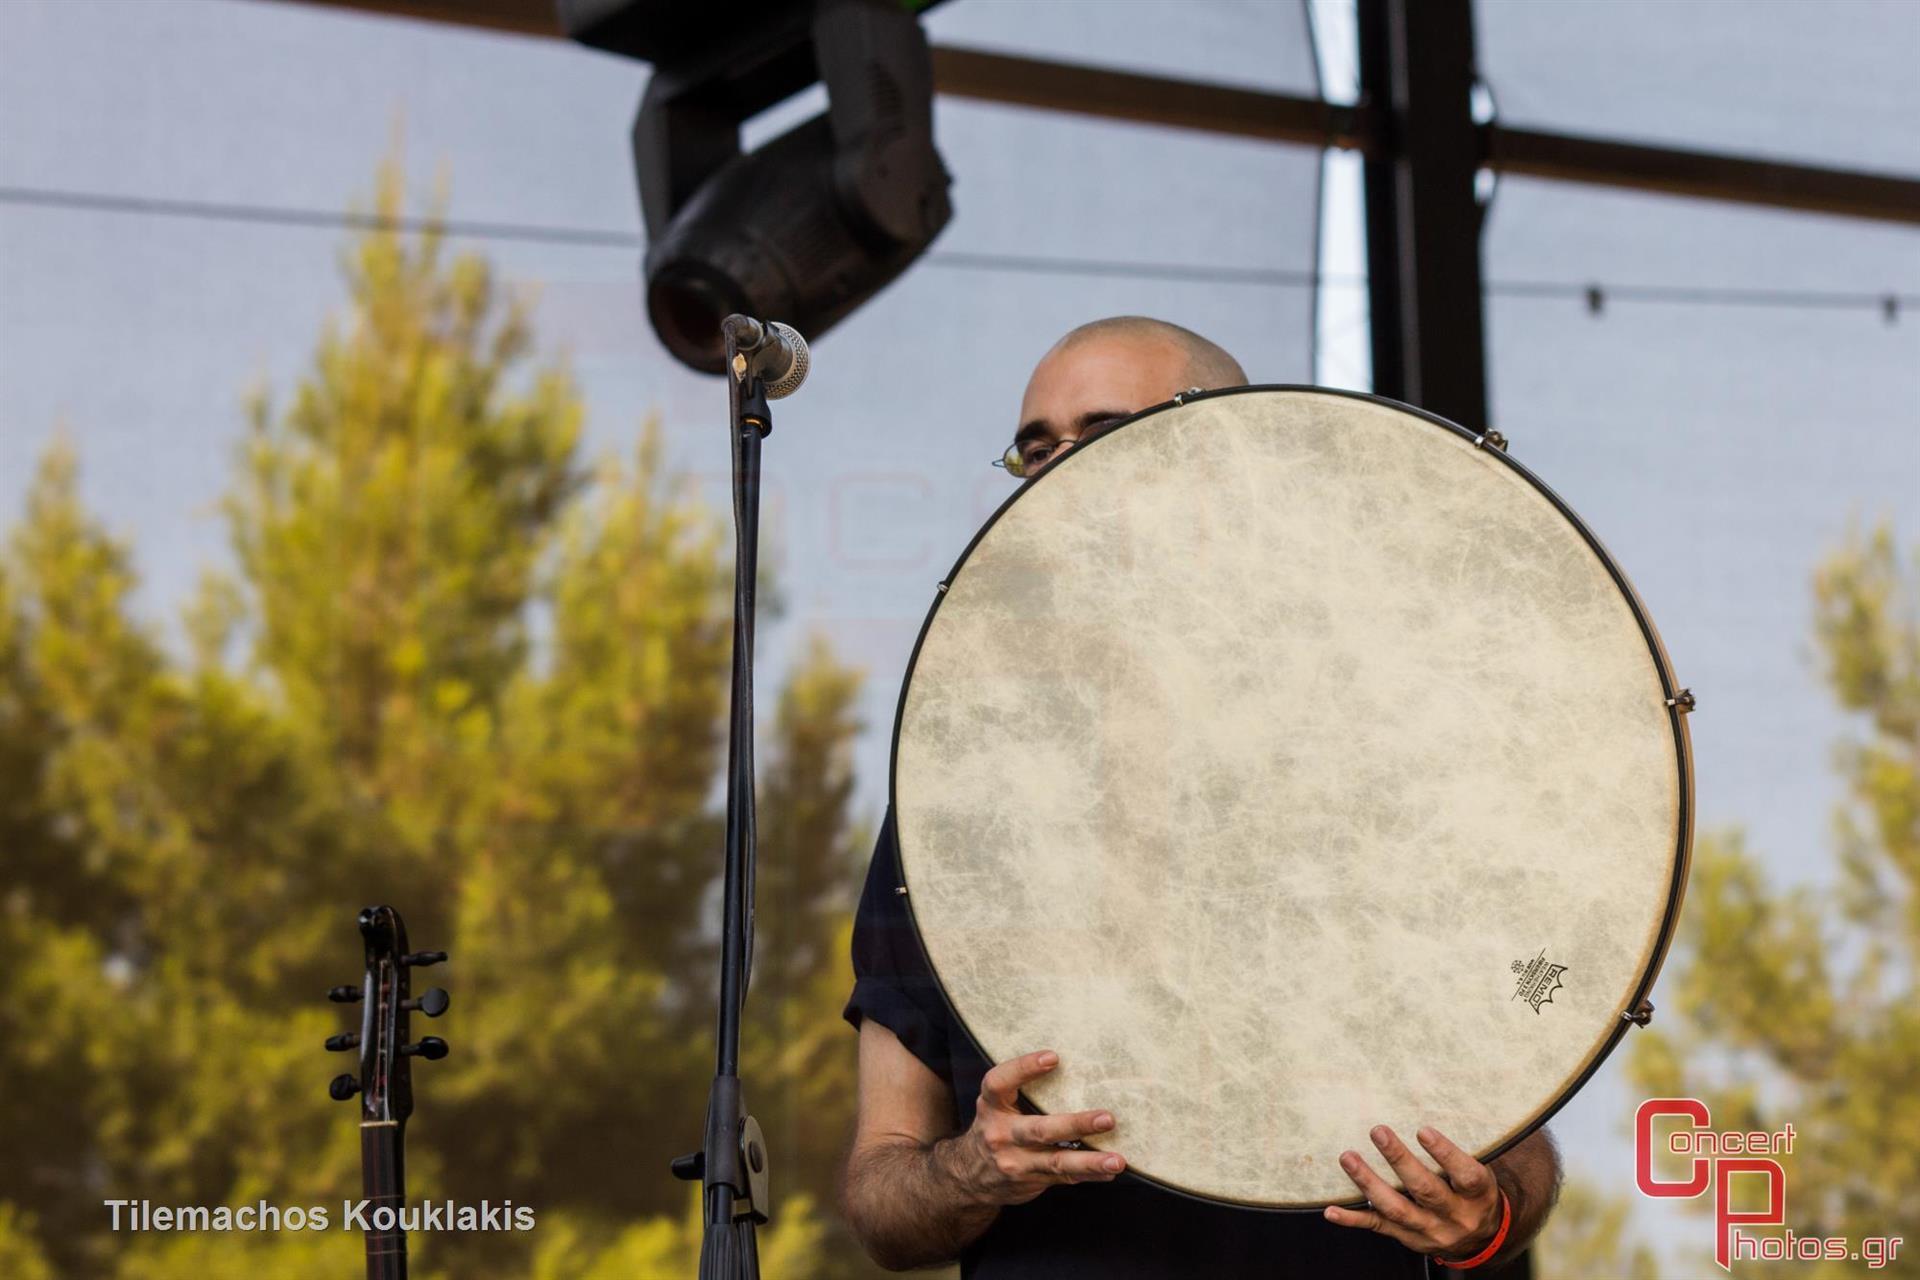 Chaostar-Chaostar photographer: Tilemachos Kouklakis - concertphotos_-0264